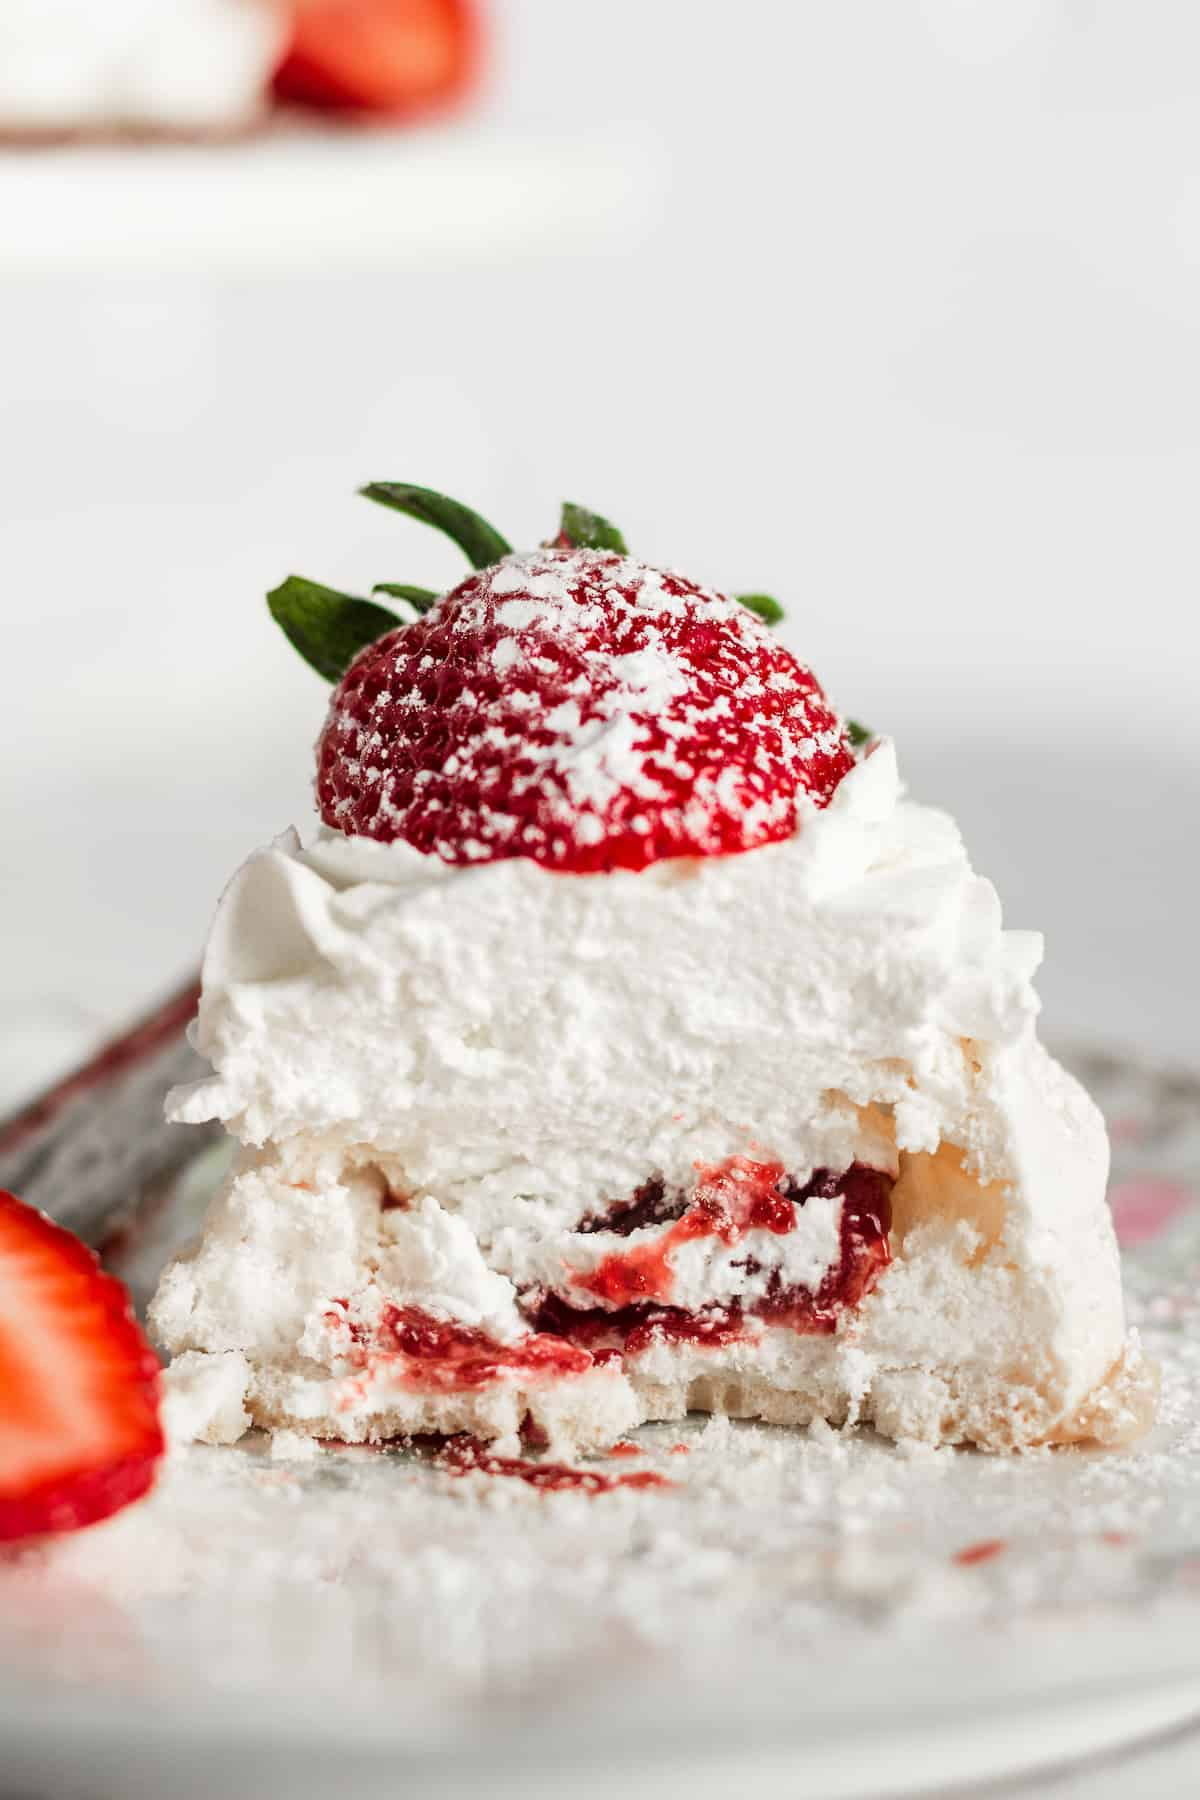 The inside of a pavlova with strawberry jam